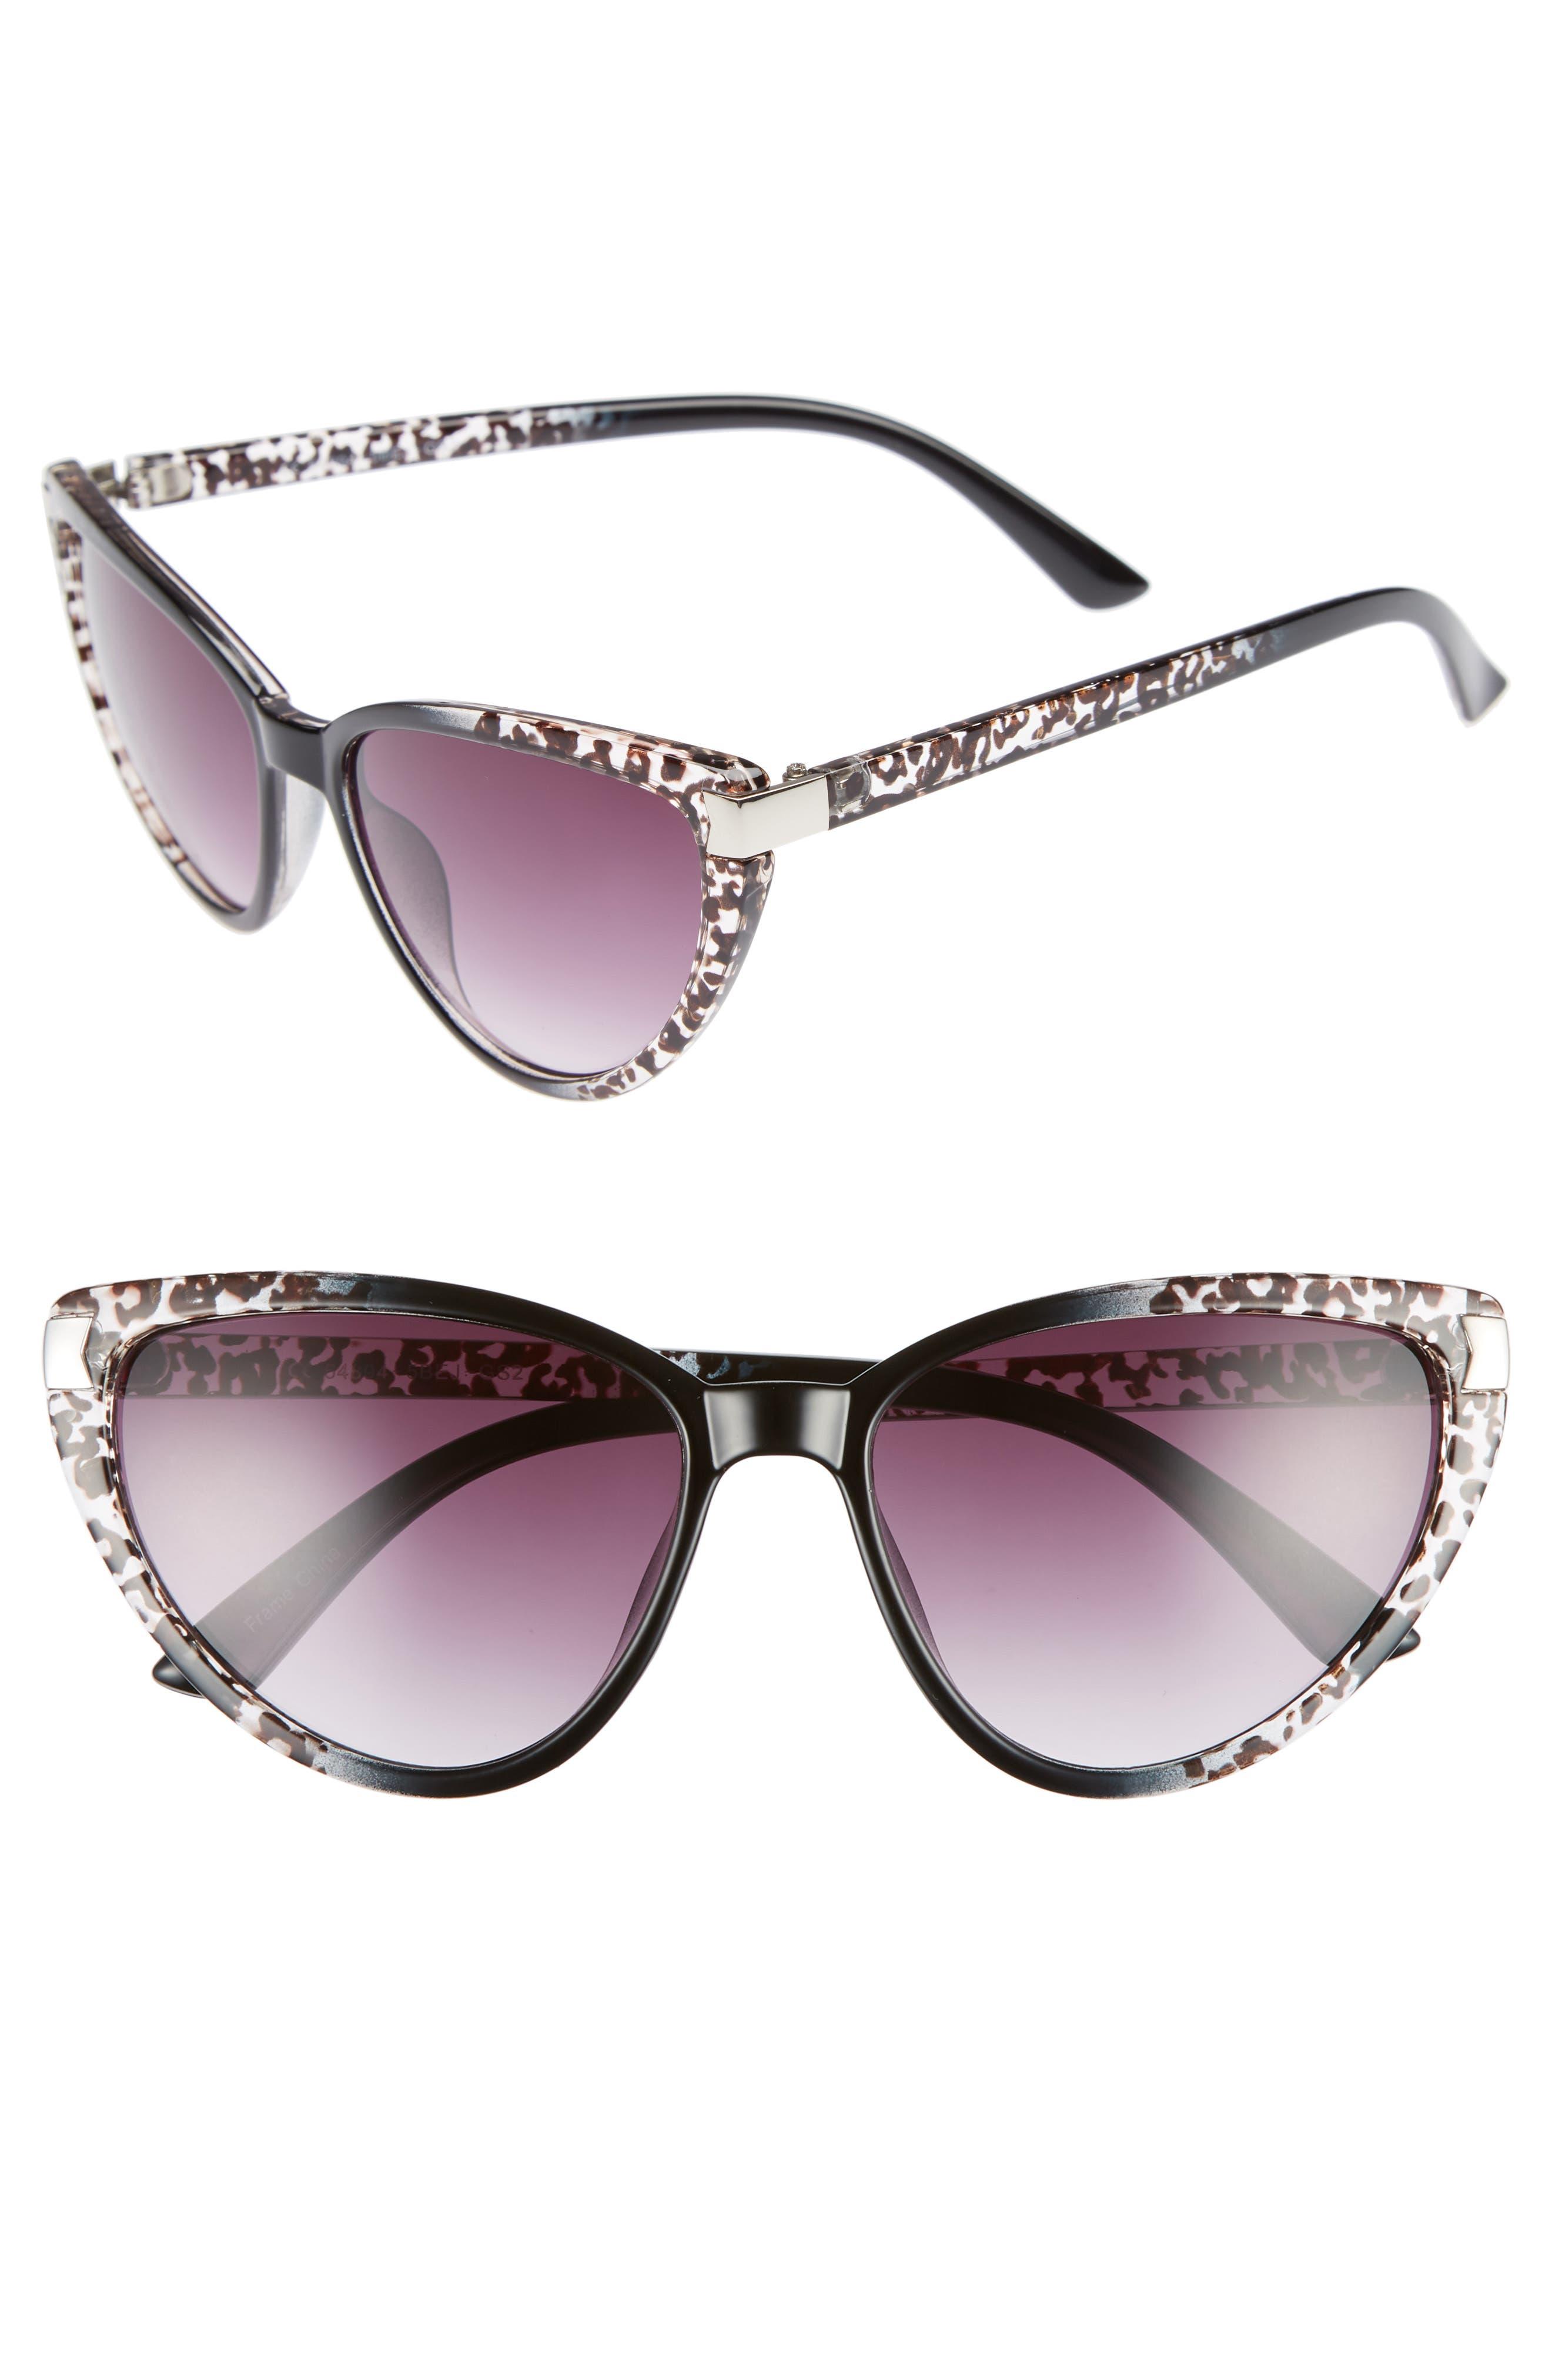 57mm Spotted Cat Eye Sunglasses,                             Main thumbnail 1, color,                             Black/ White